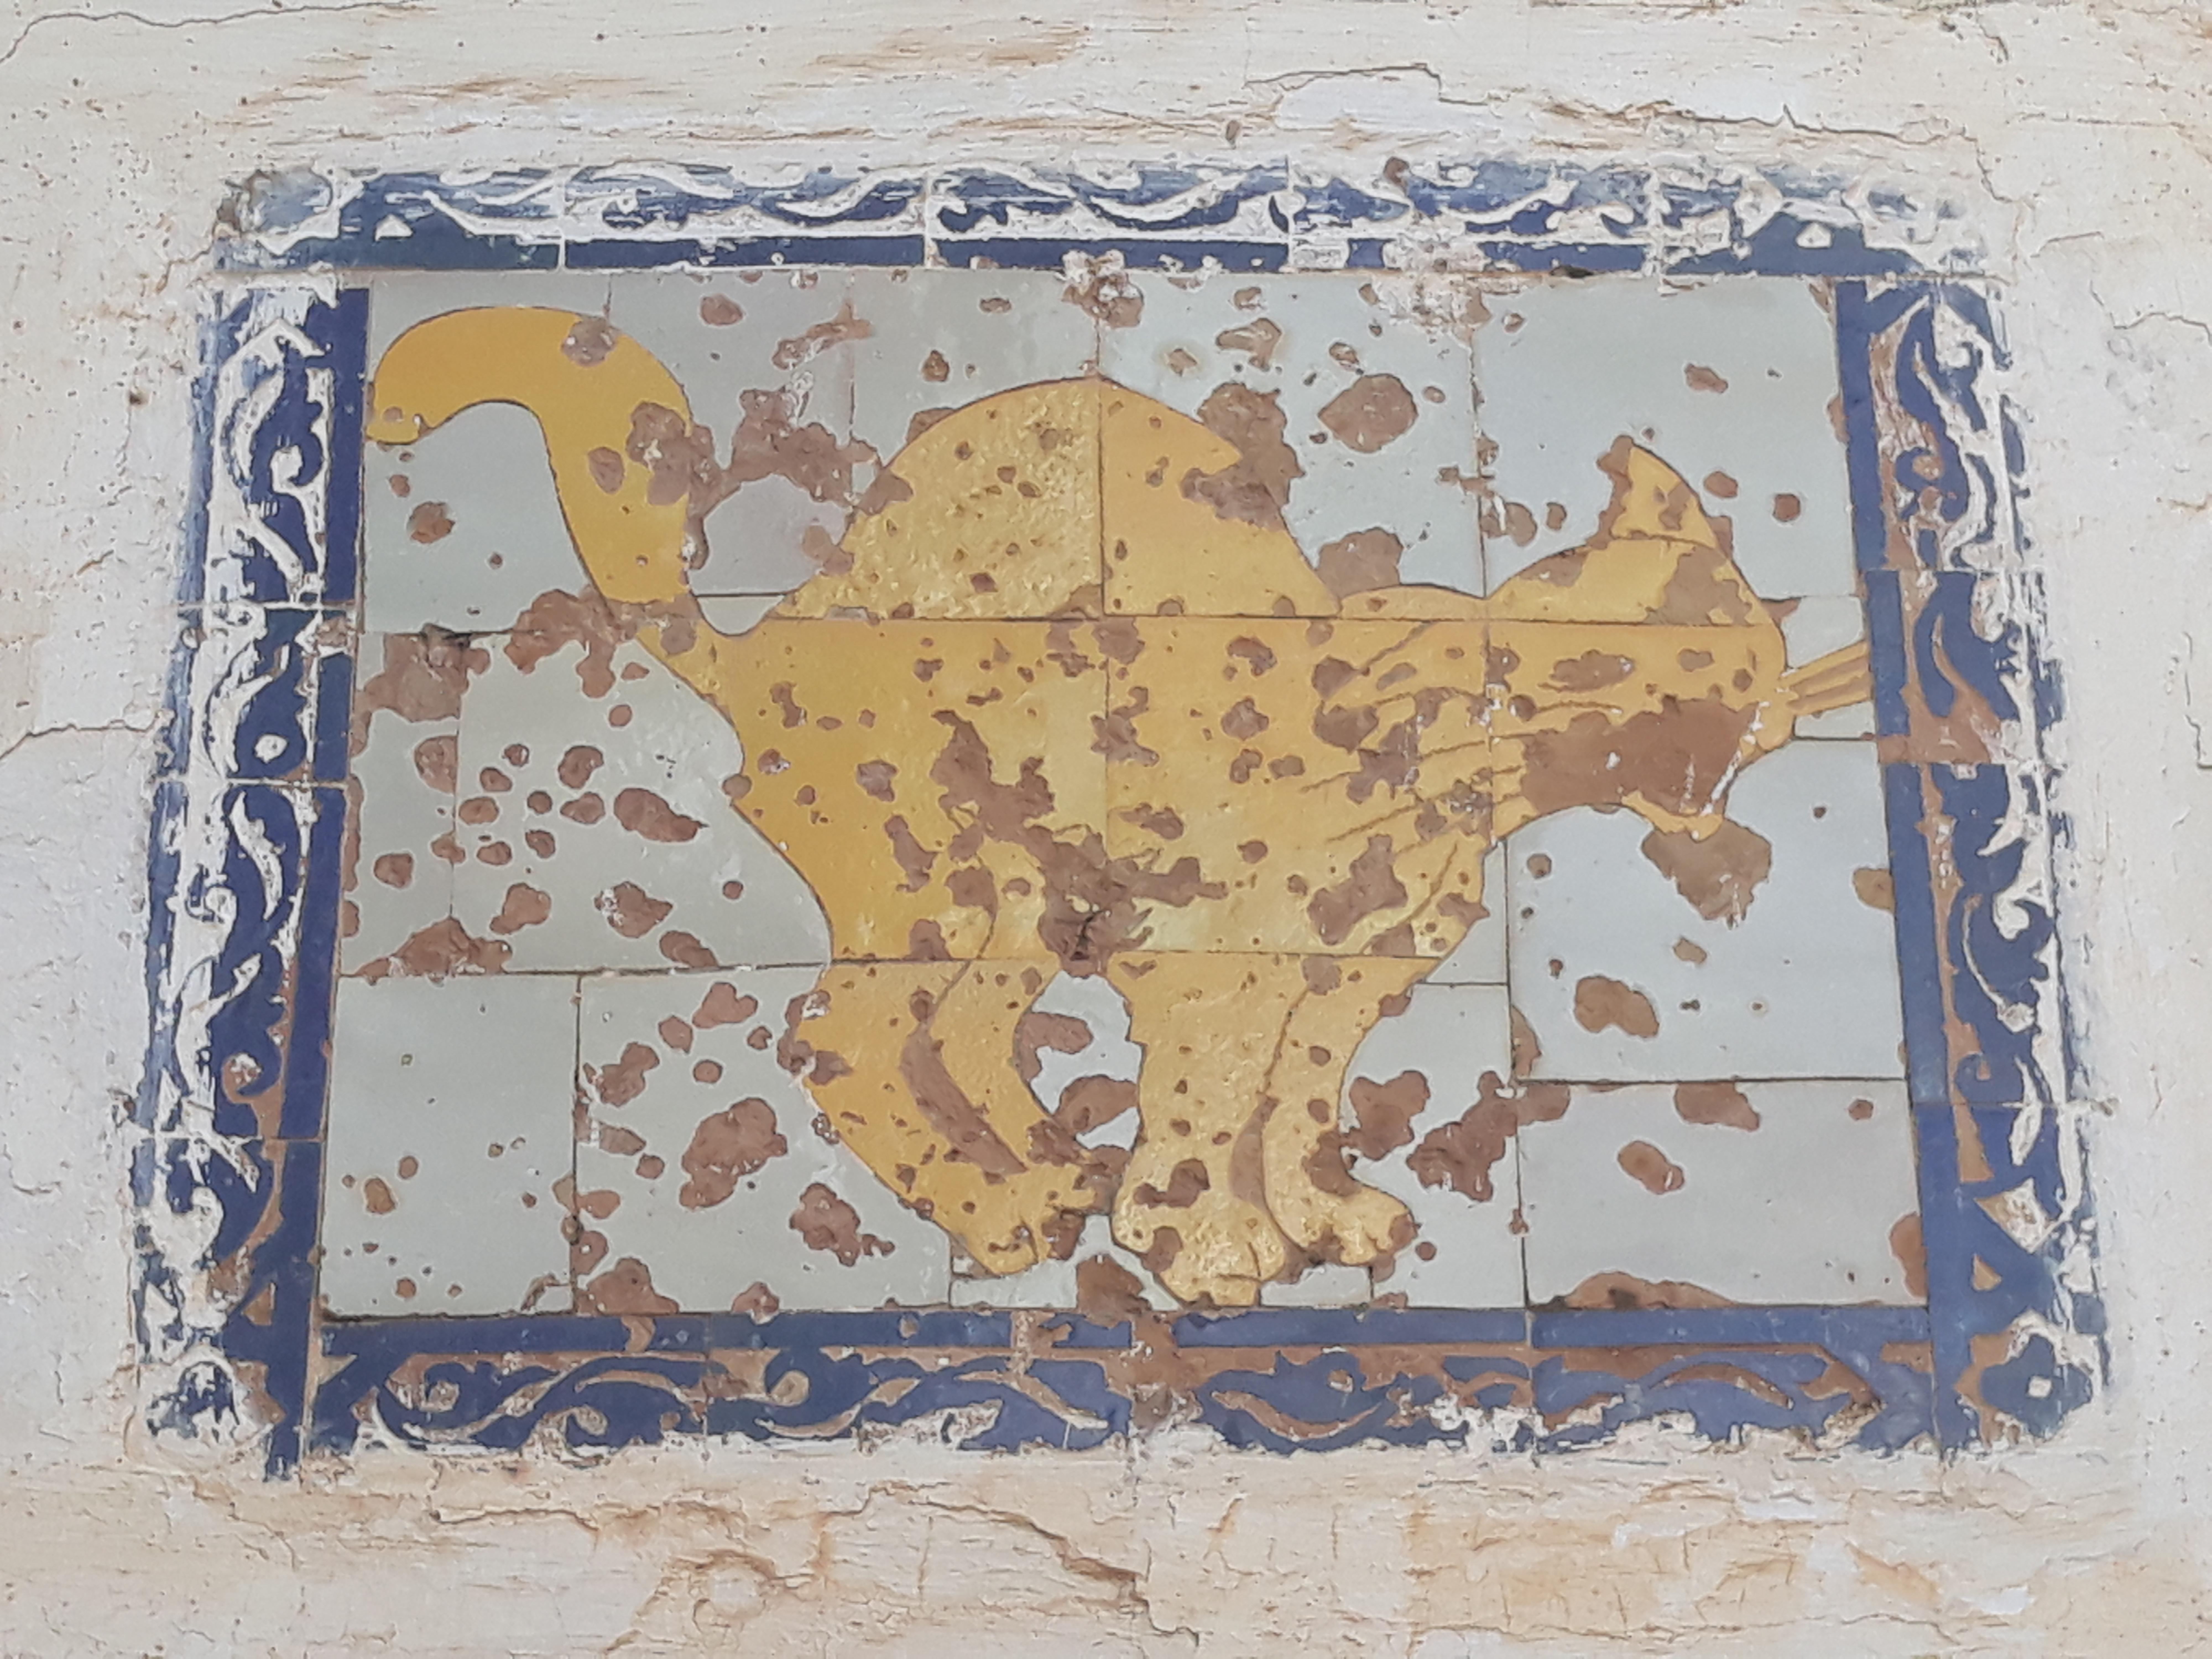 Mosaic, Kasbah of the Udayas, Rabat